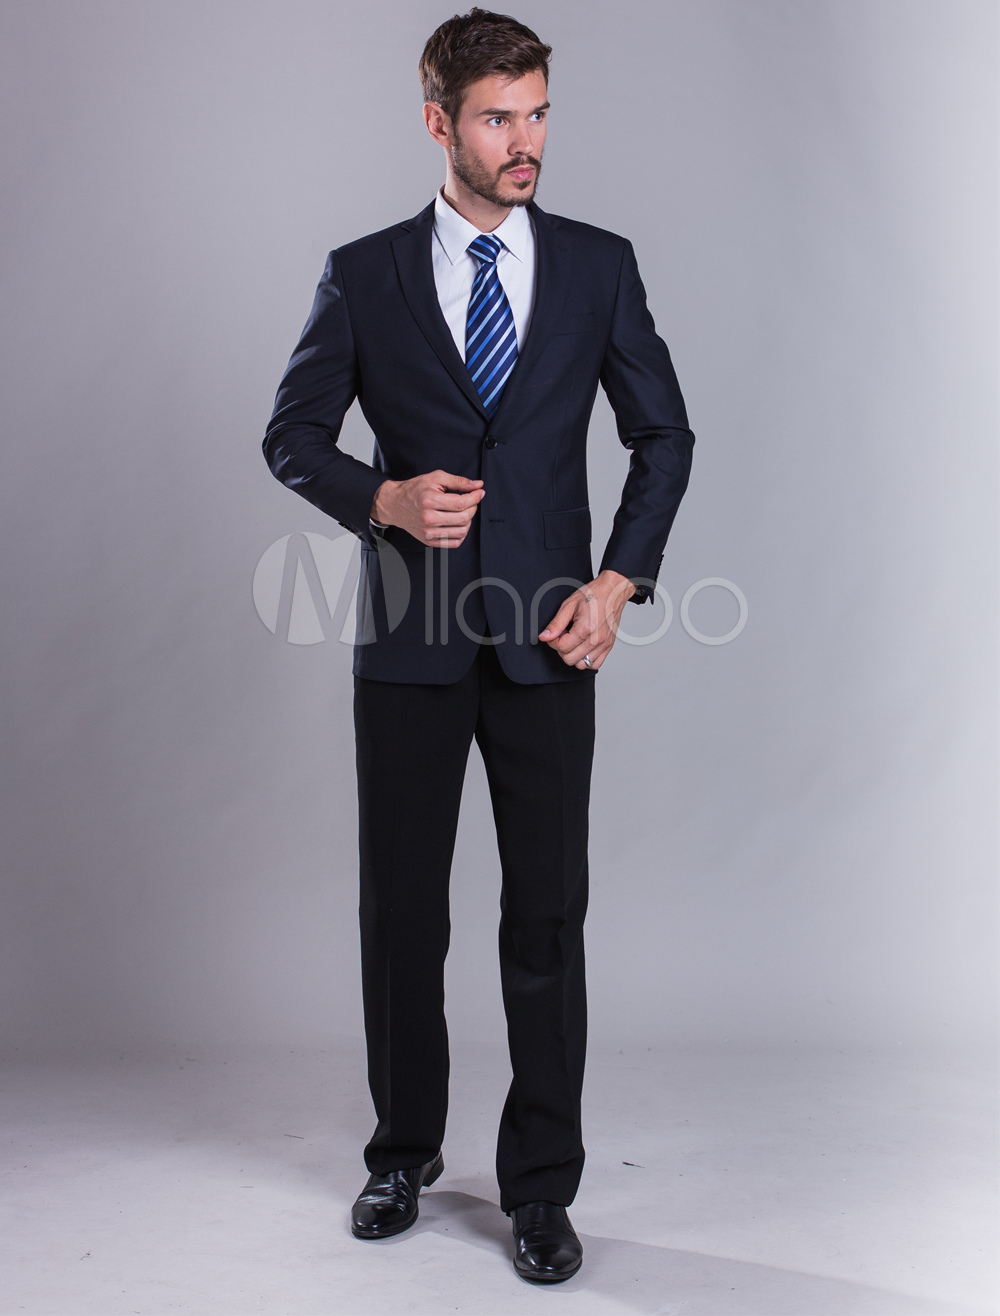 costume homme bleu marine fonc fente arri re. Black Bedroom Furniture Sets. Home Design Ideas